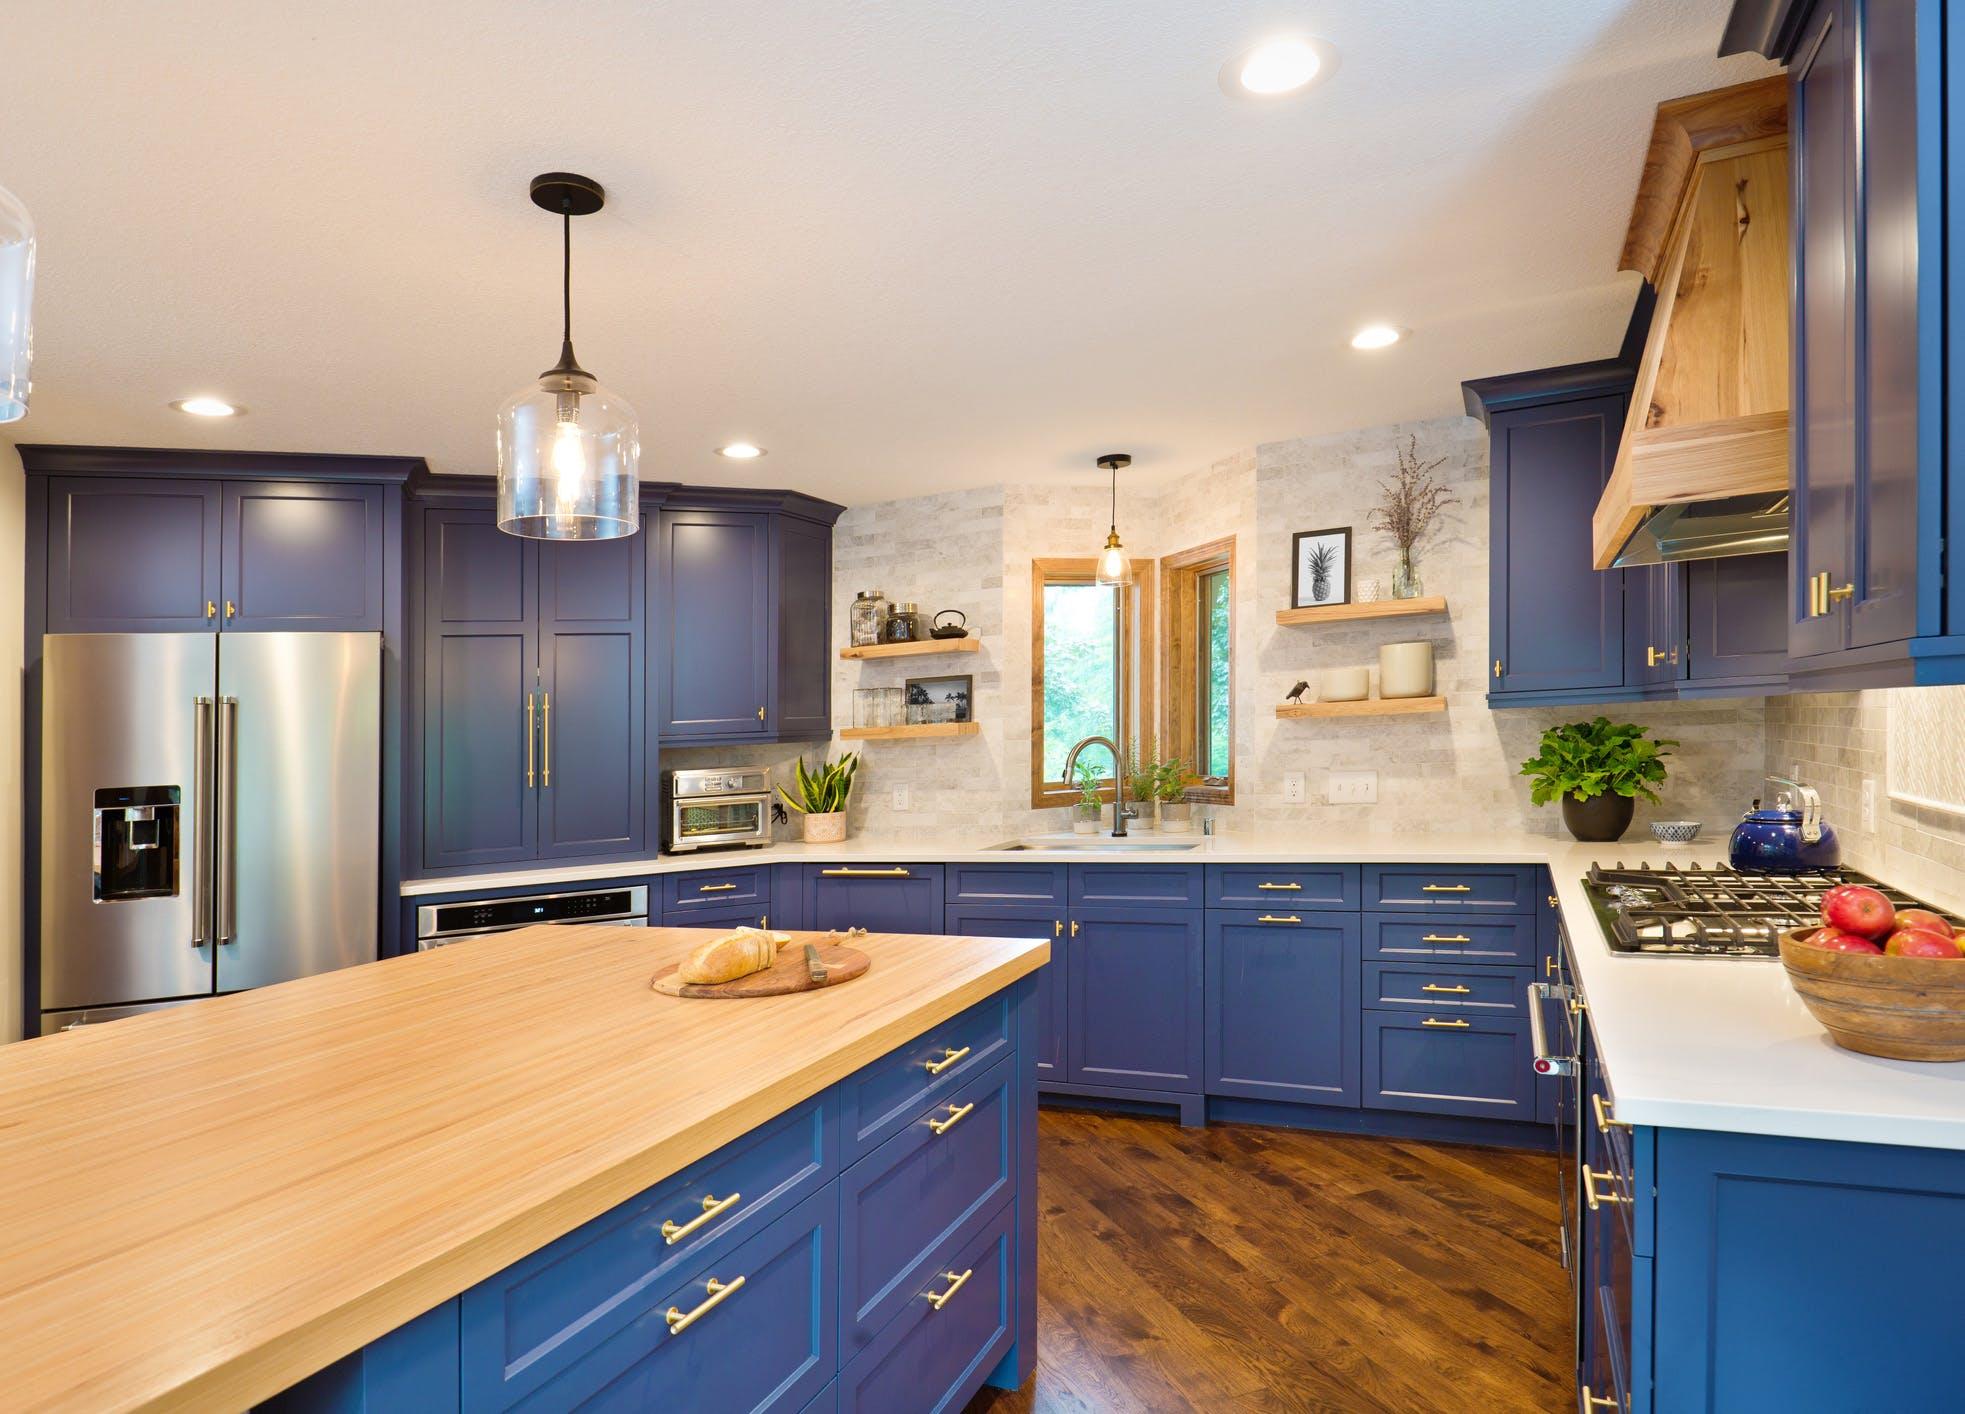 generational homebuying preferences kitchen1